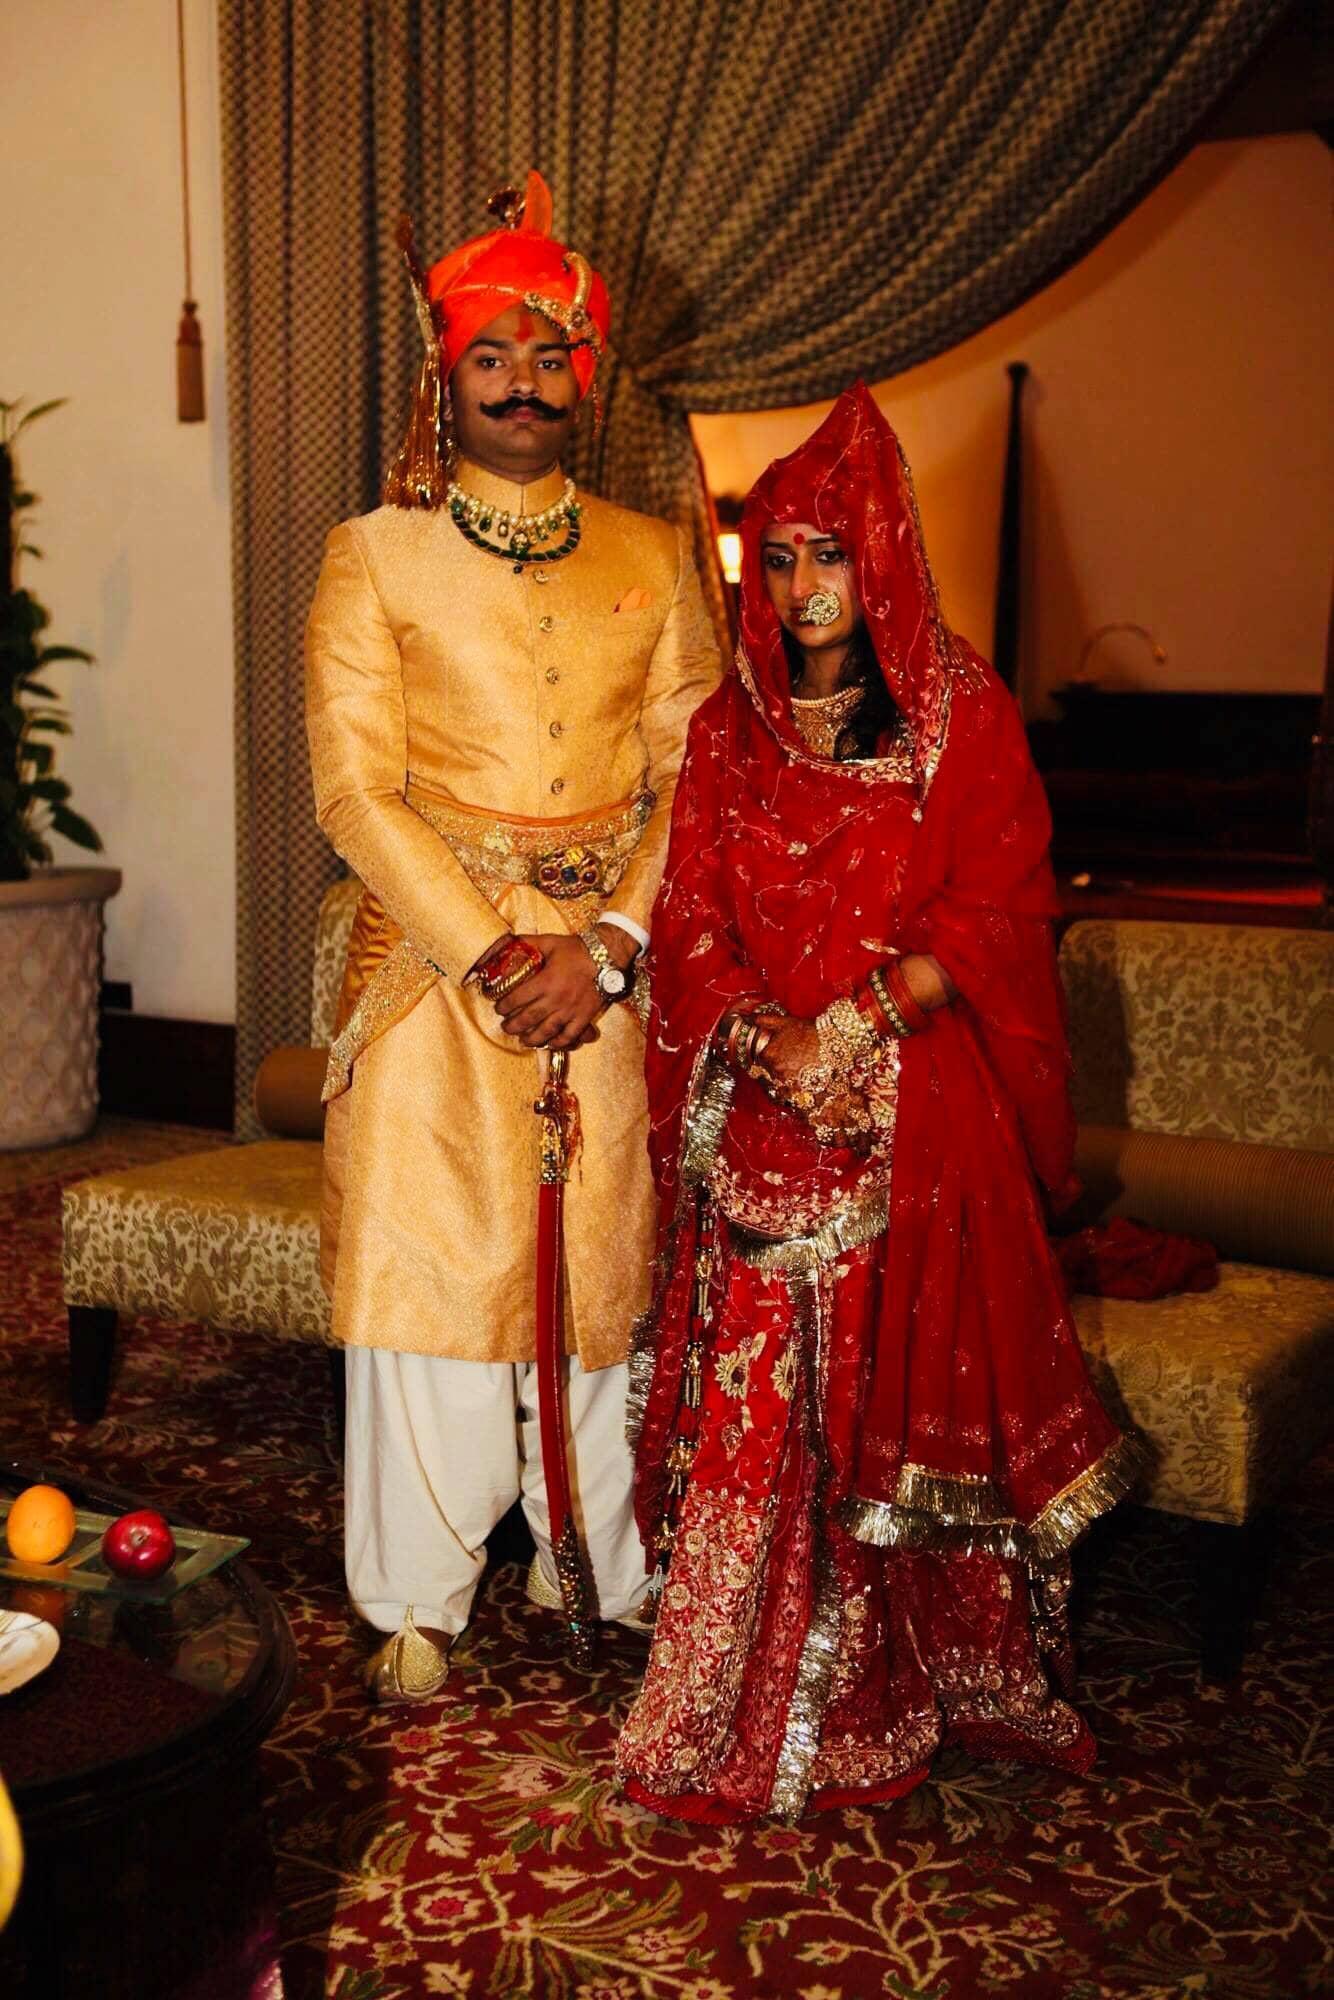 Padmini with her husband, Karni Singh Sodha